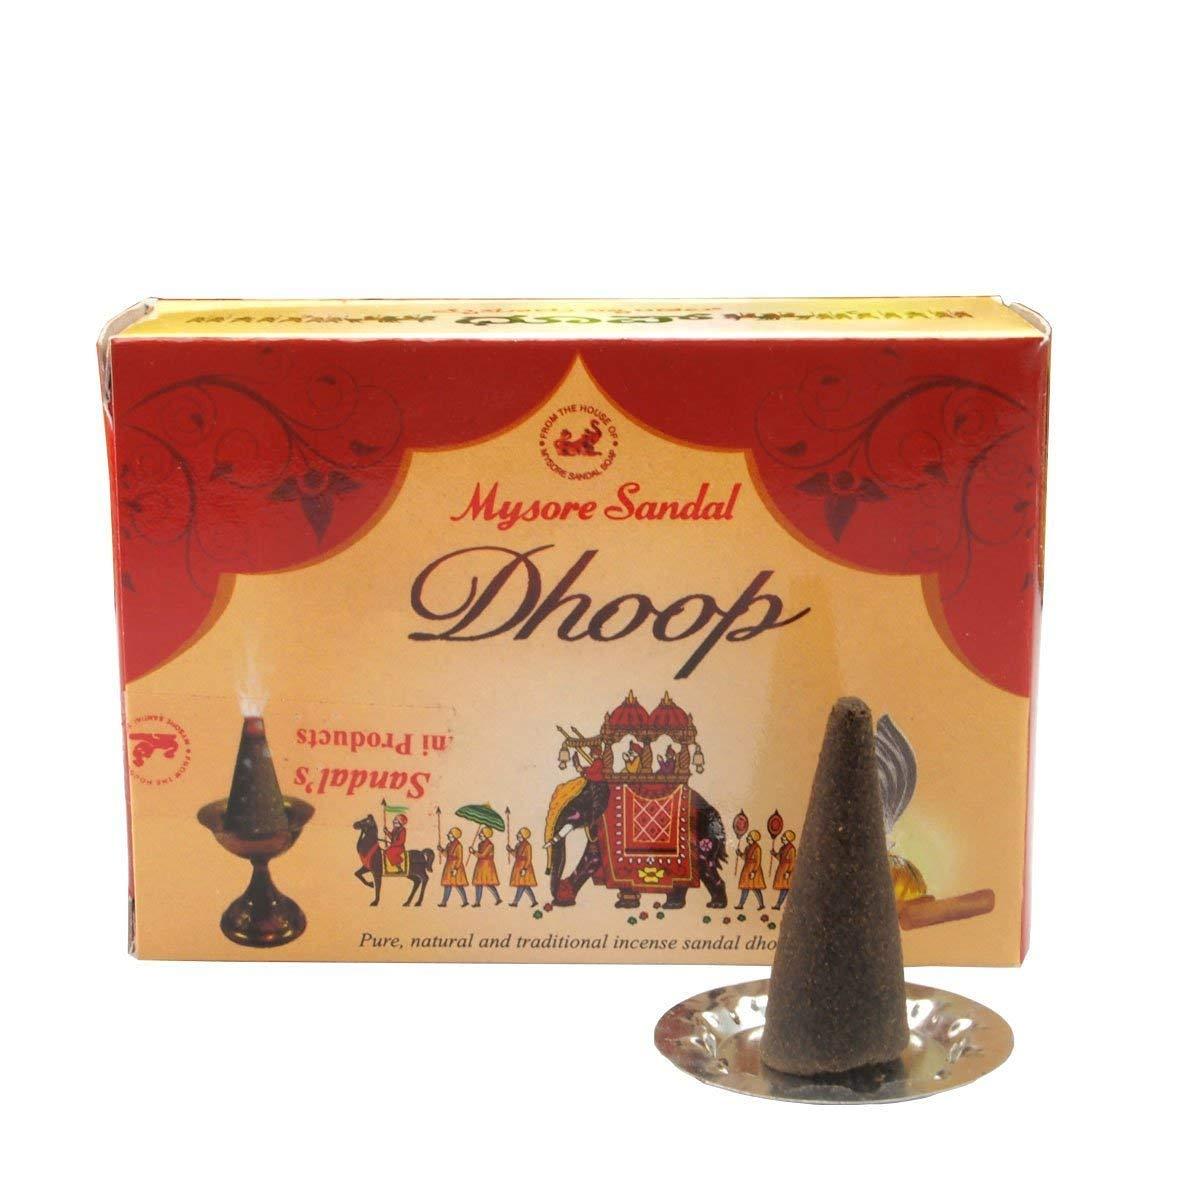 Mysore Sandal Dhoop Cones